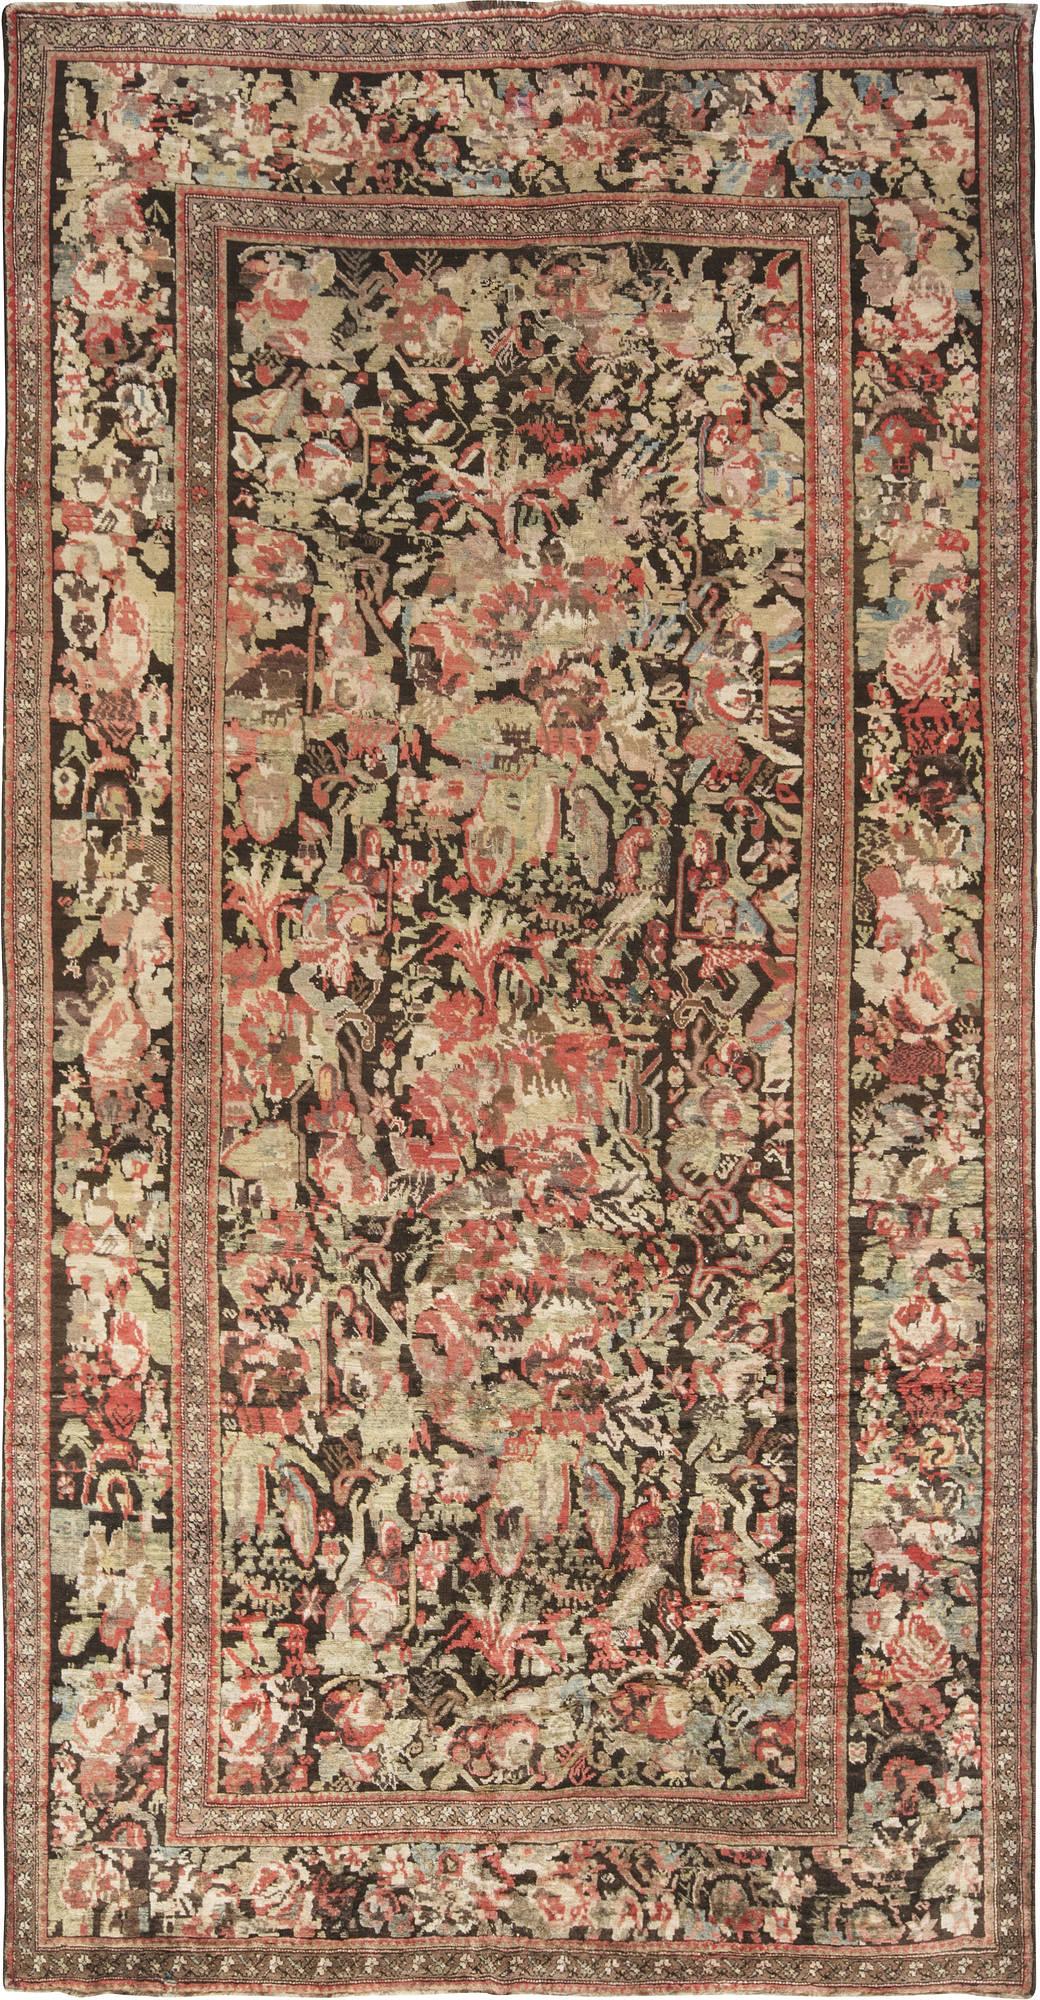 Antique Karabagh Carpet BB6621